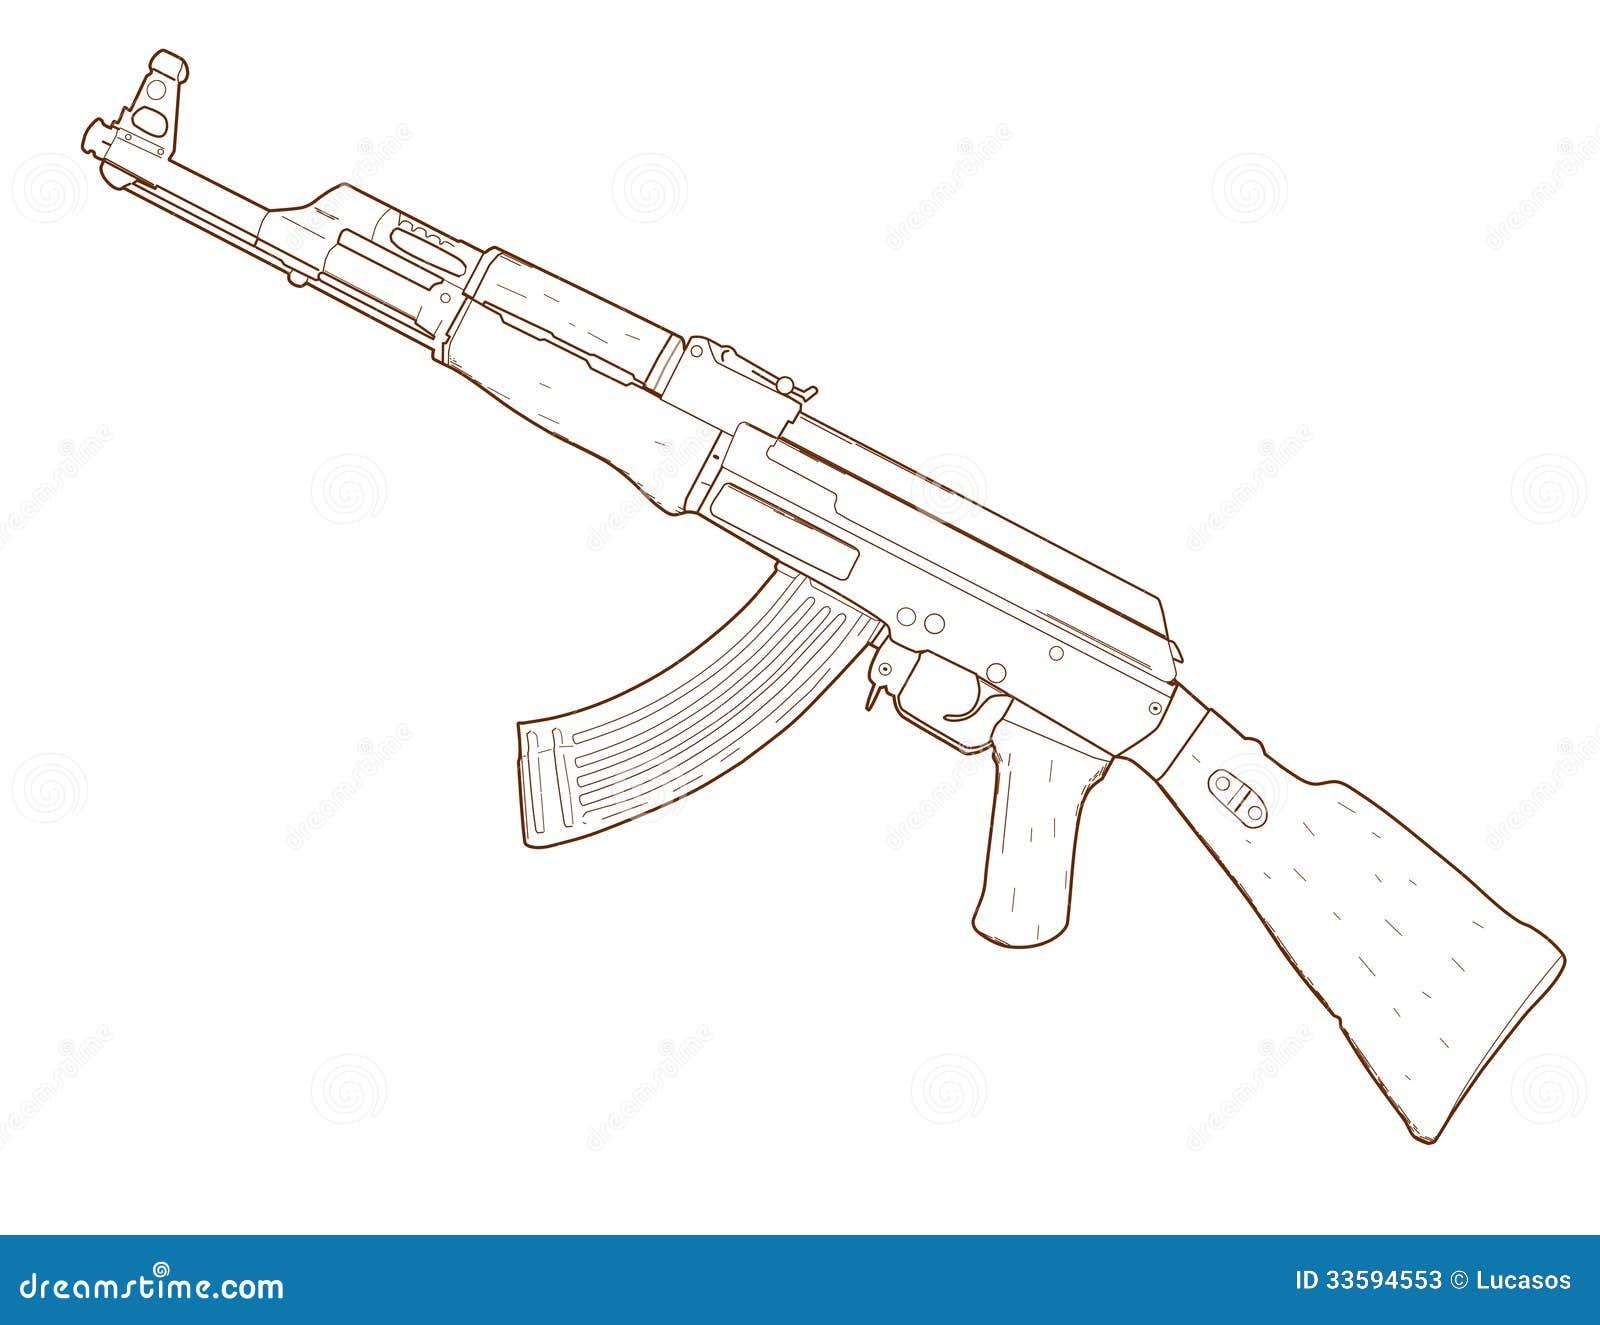 Rifle Ak 47 Stock Illustration Image Of Sketch Ak47